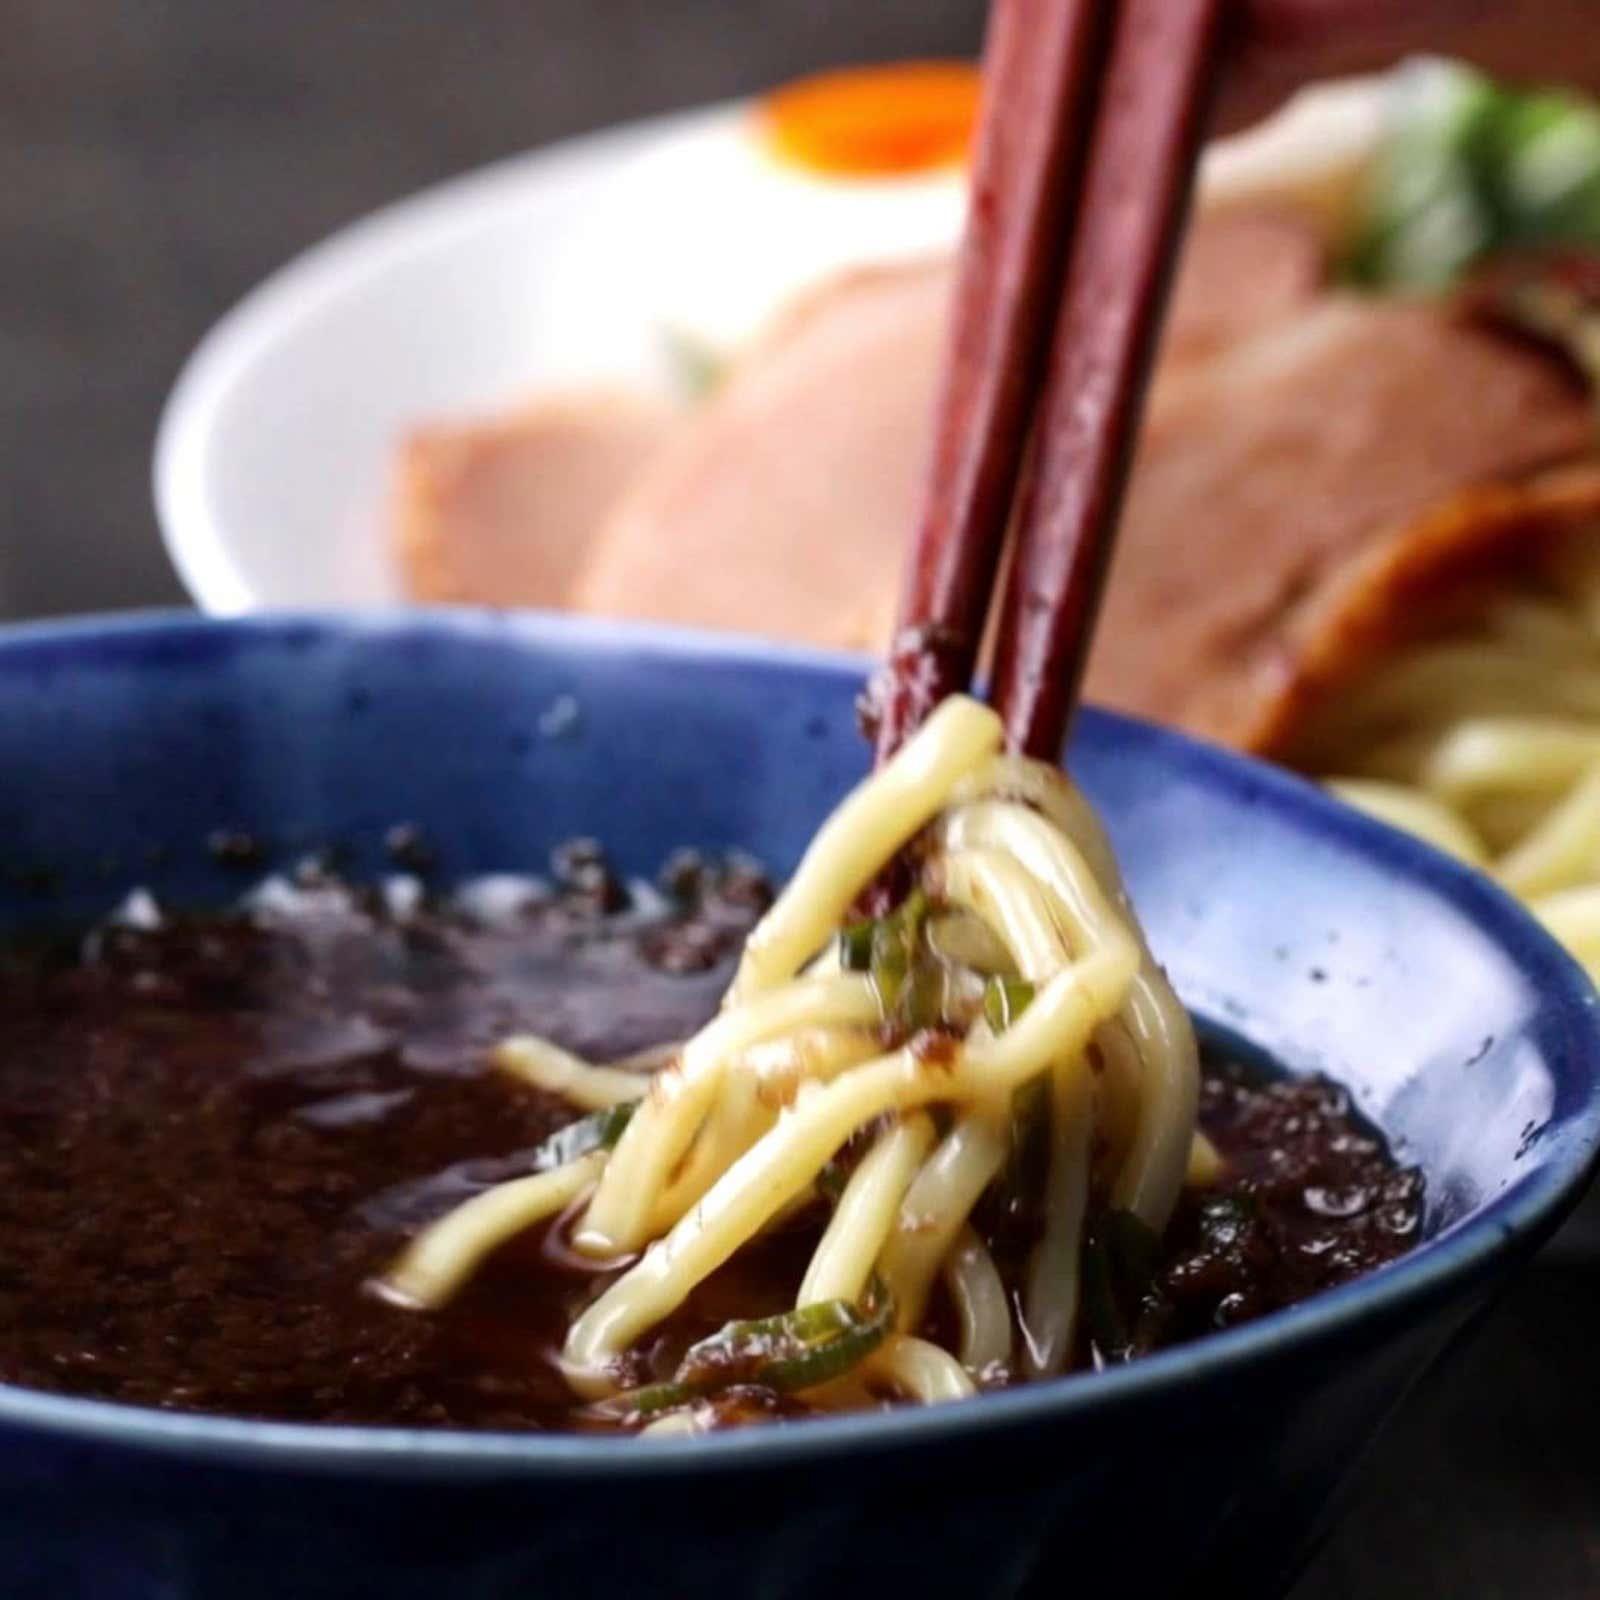 Tsukemen (Dipping Noodles)